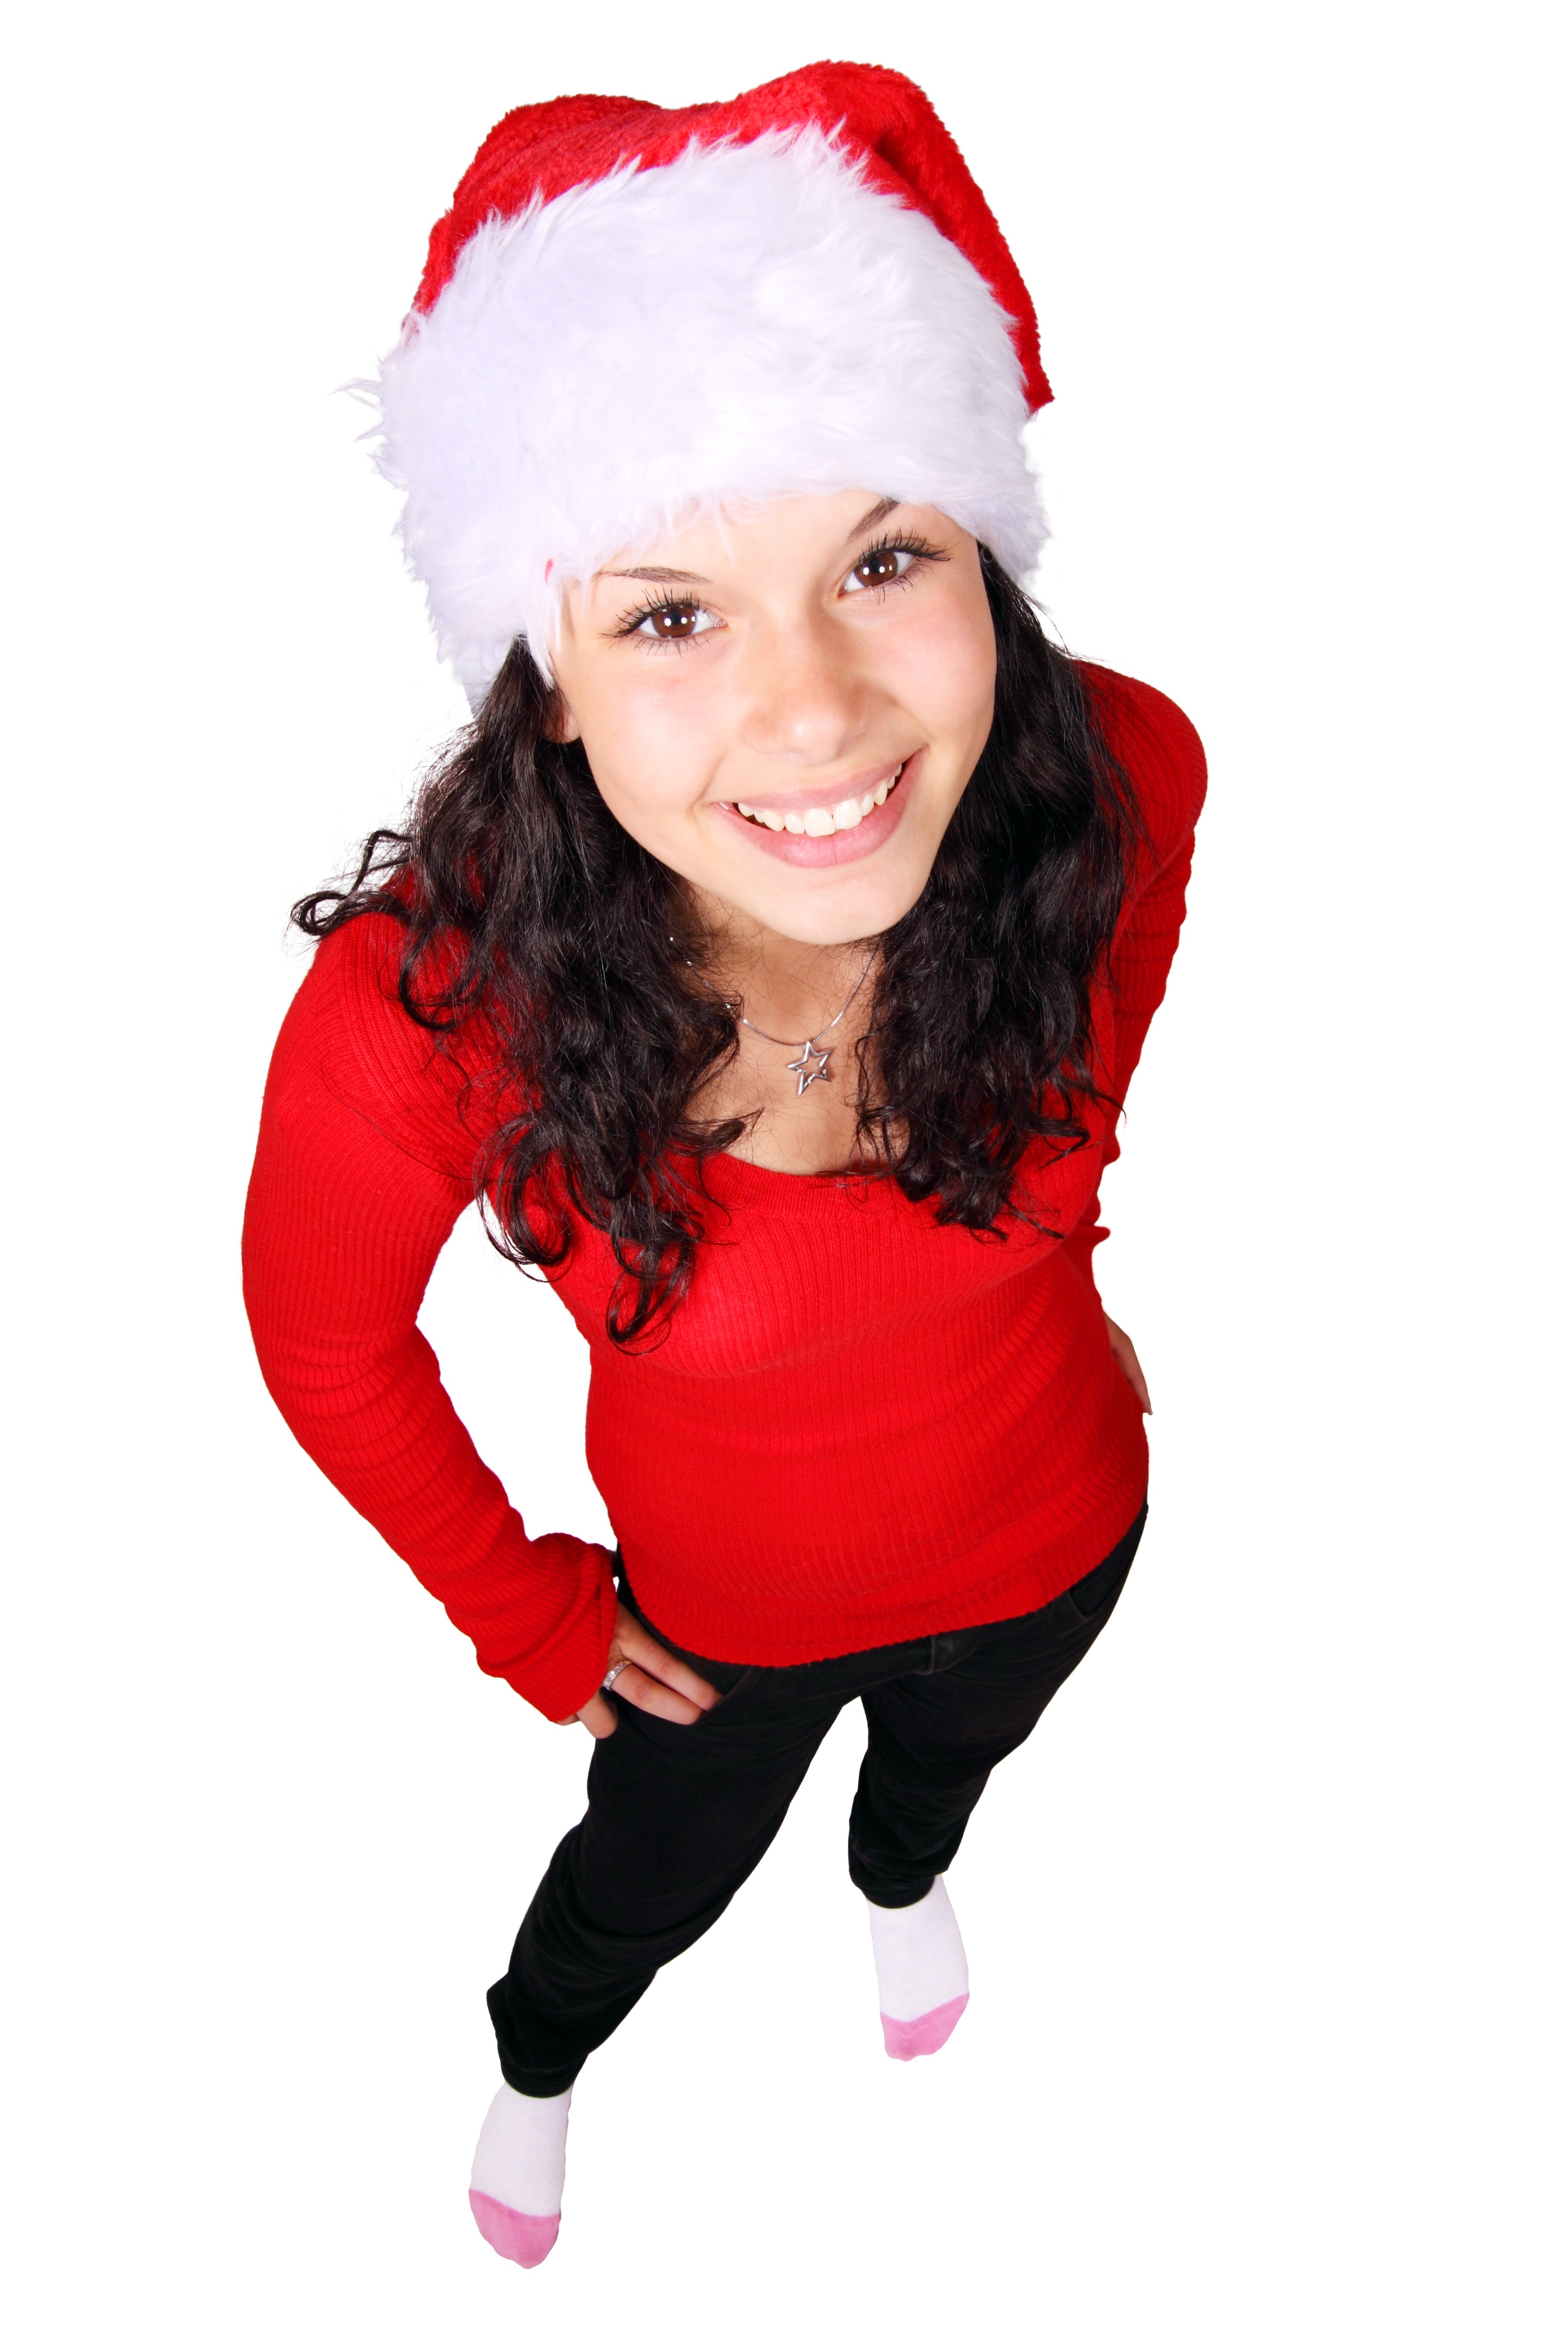 Girl on Christmas, Activity, Celebrate, Celebration, Christmas, HQ Photo